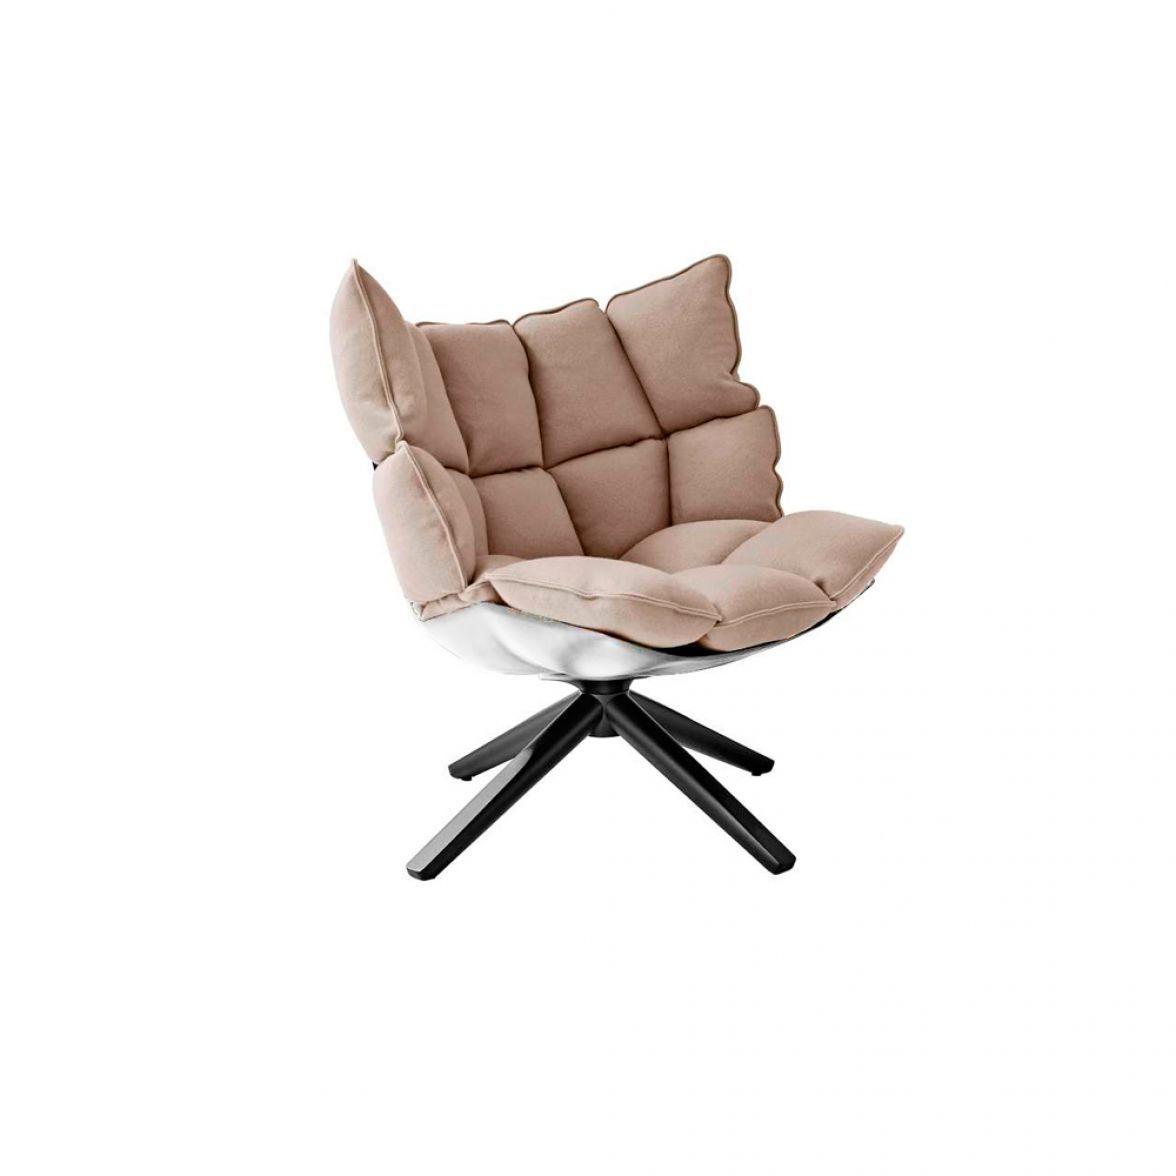 Husk armchair фото цена